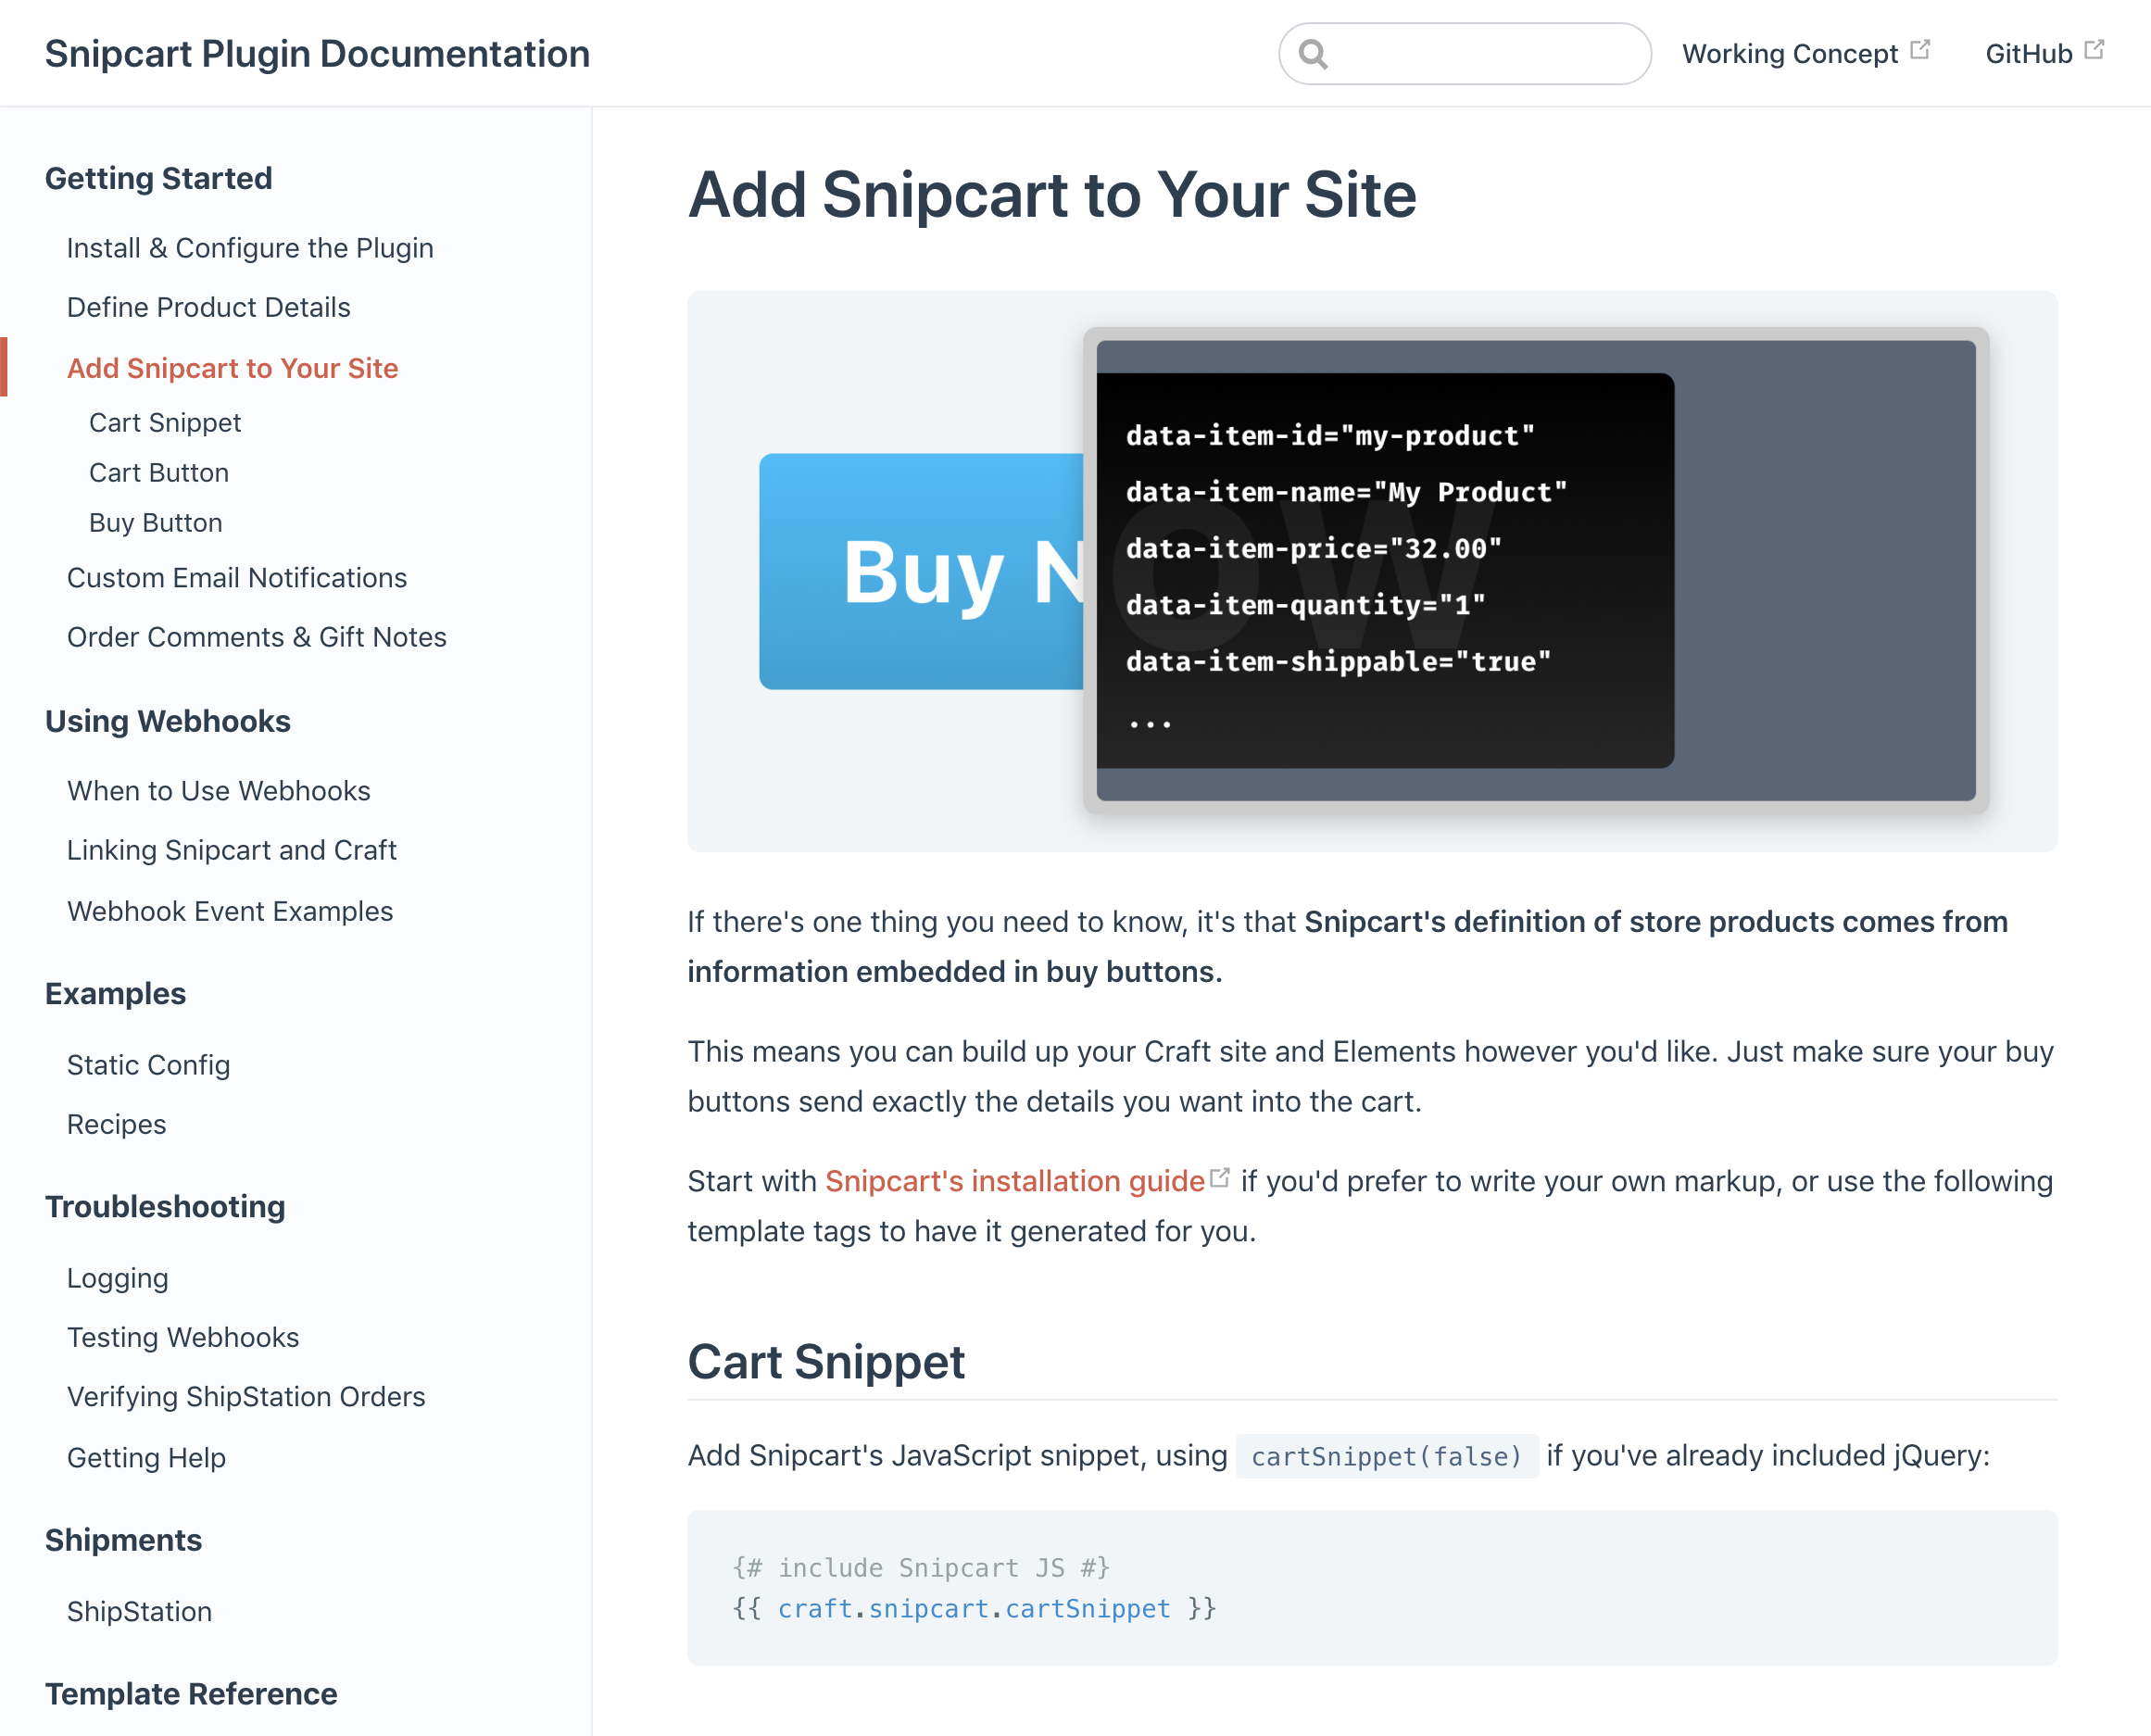 Snipcart Plugin Documentation